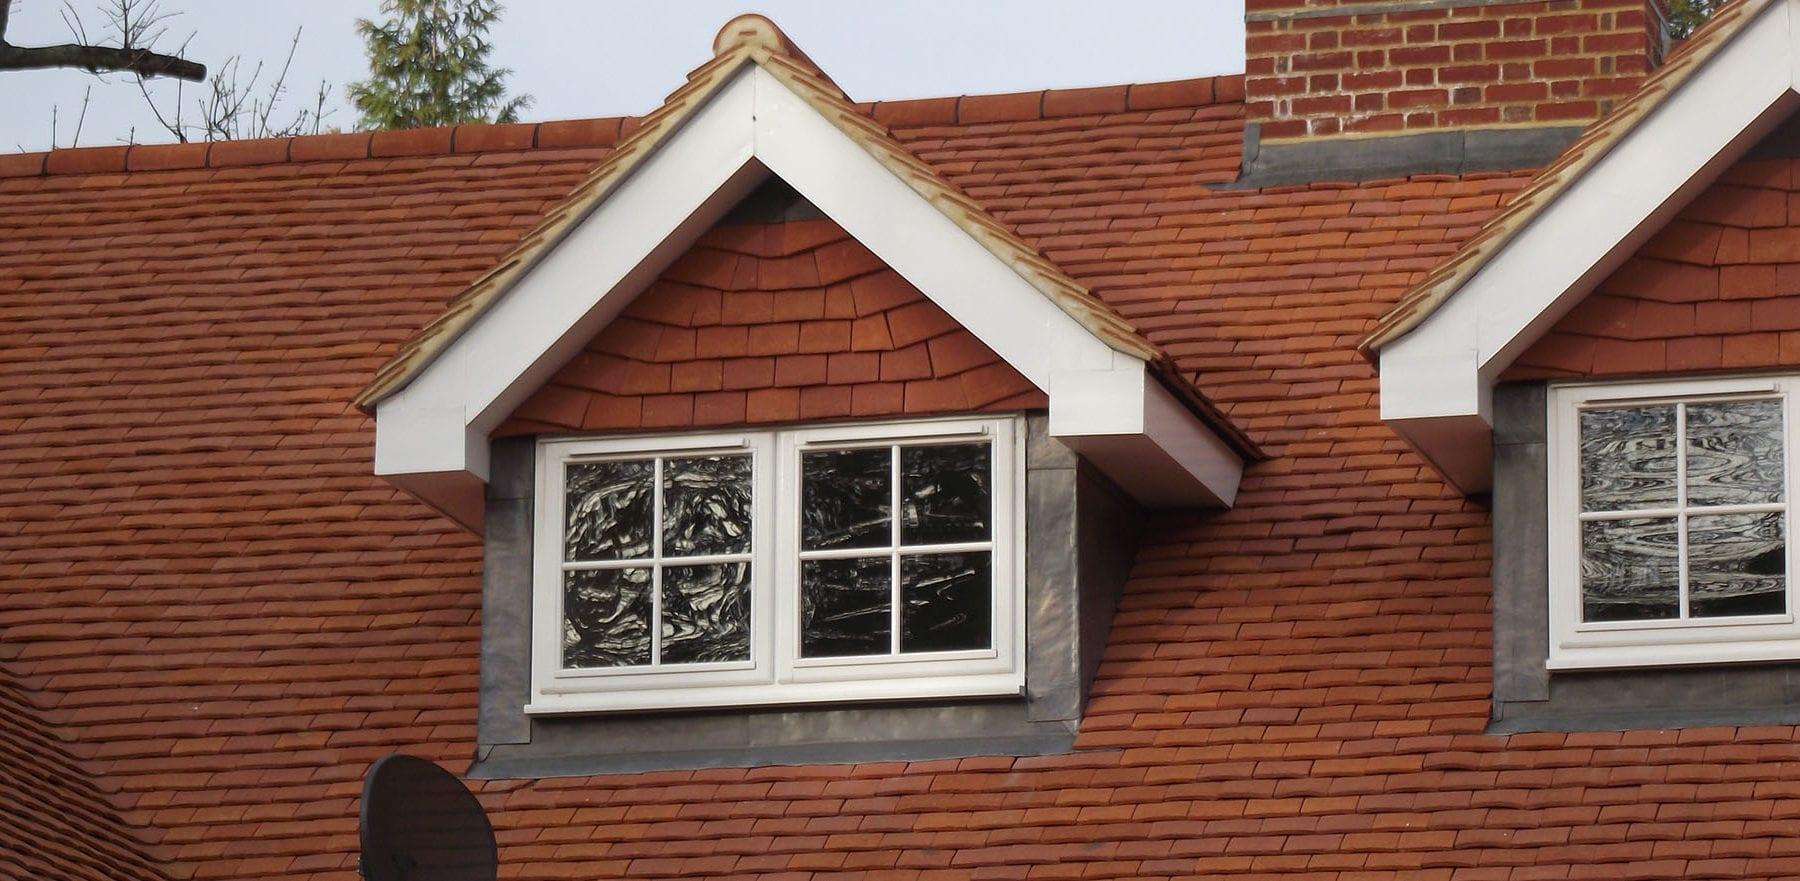 Lifestiles - Handcrafted Orange Clay Roof Tiles - Farningham, England 4